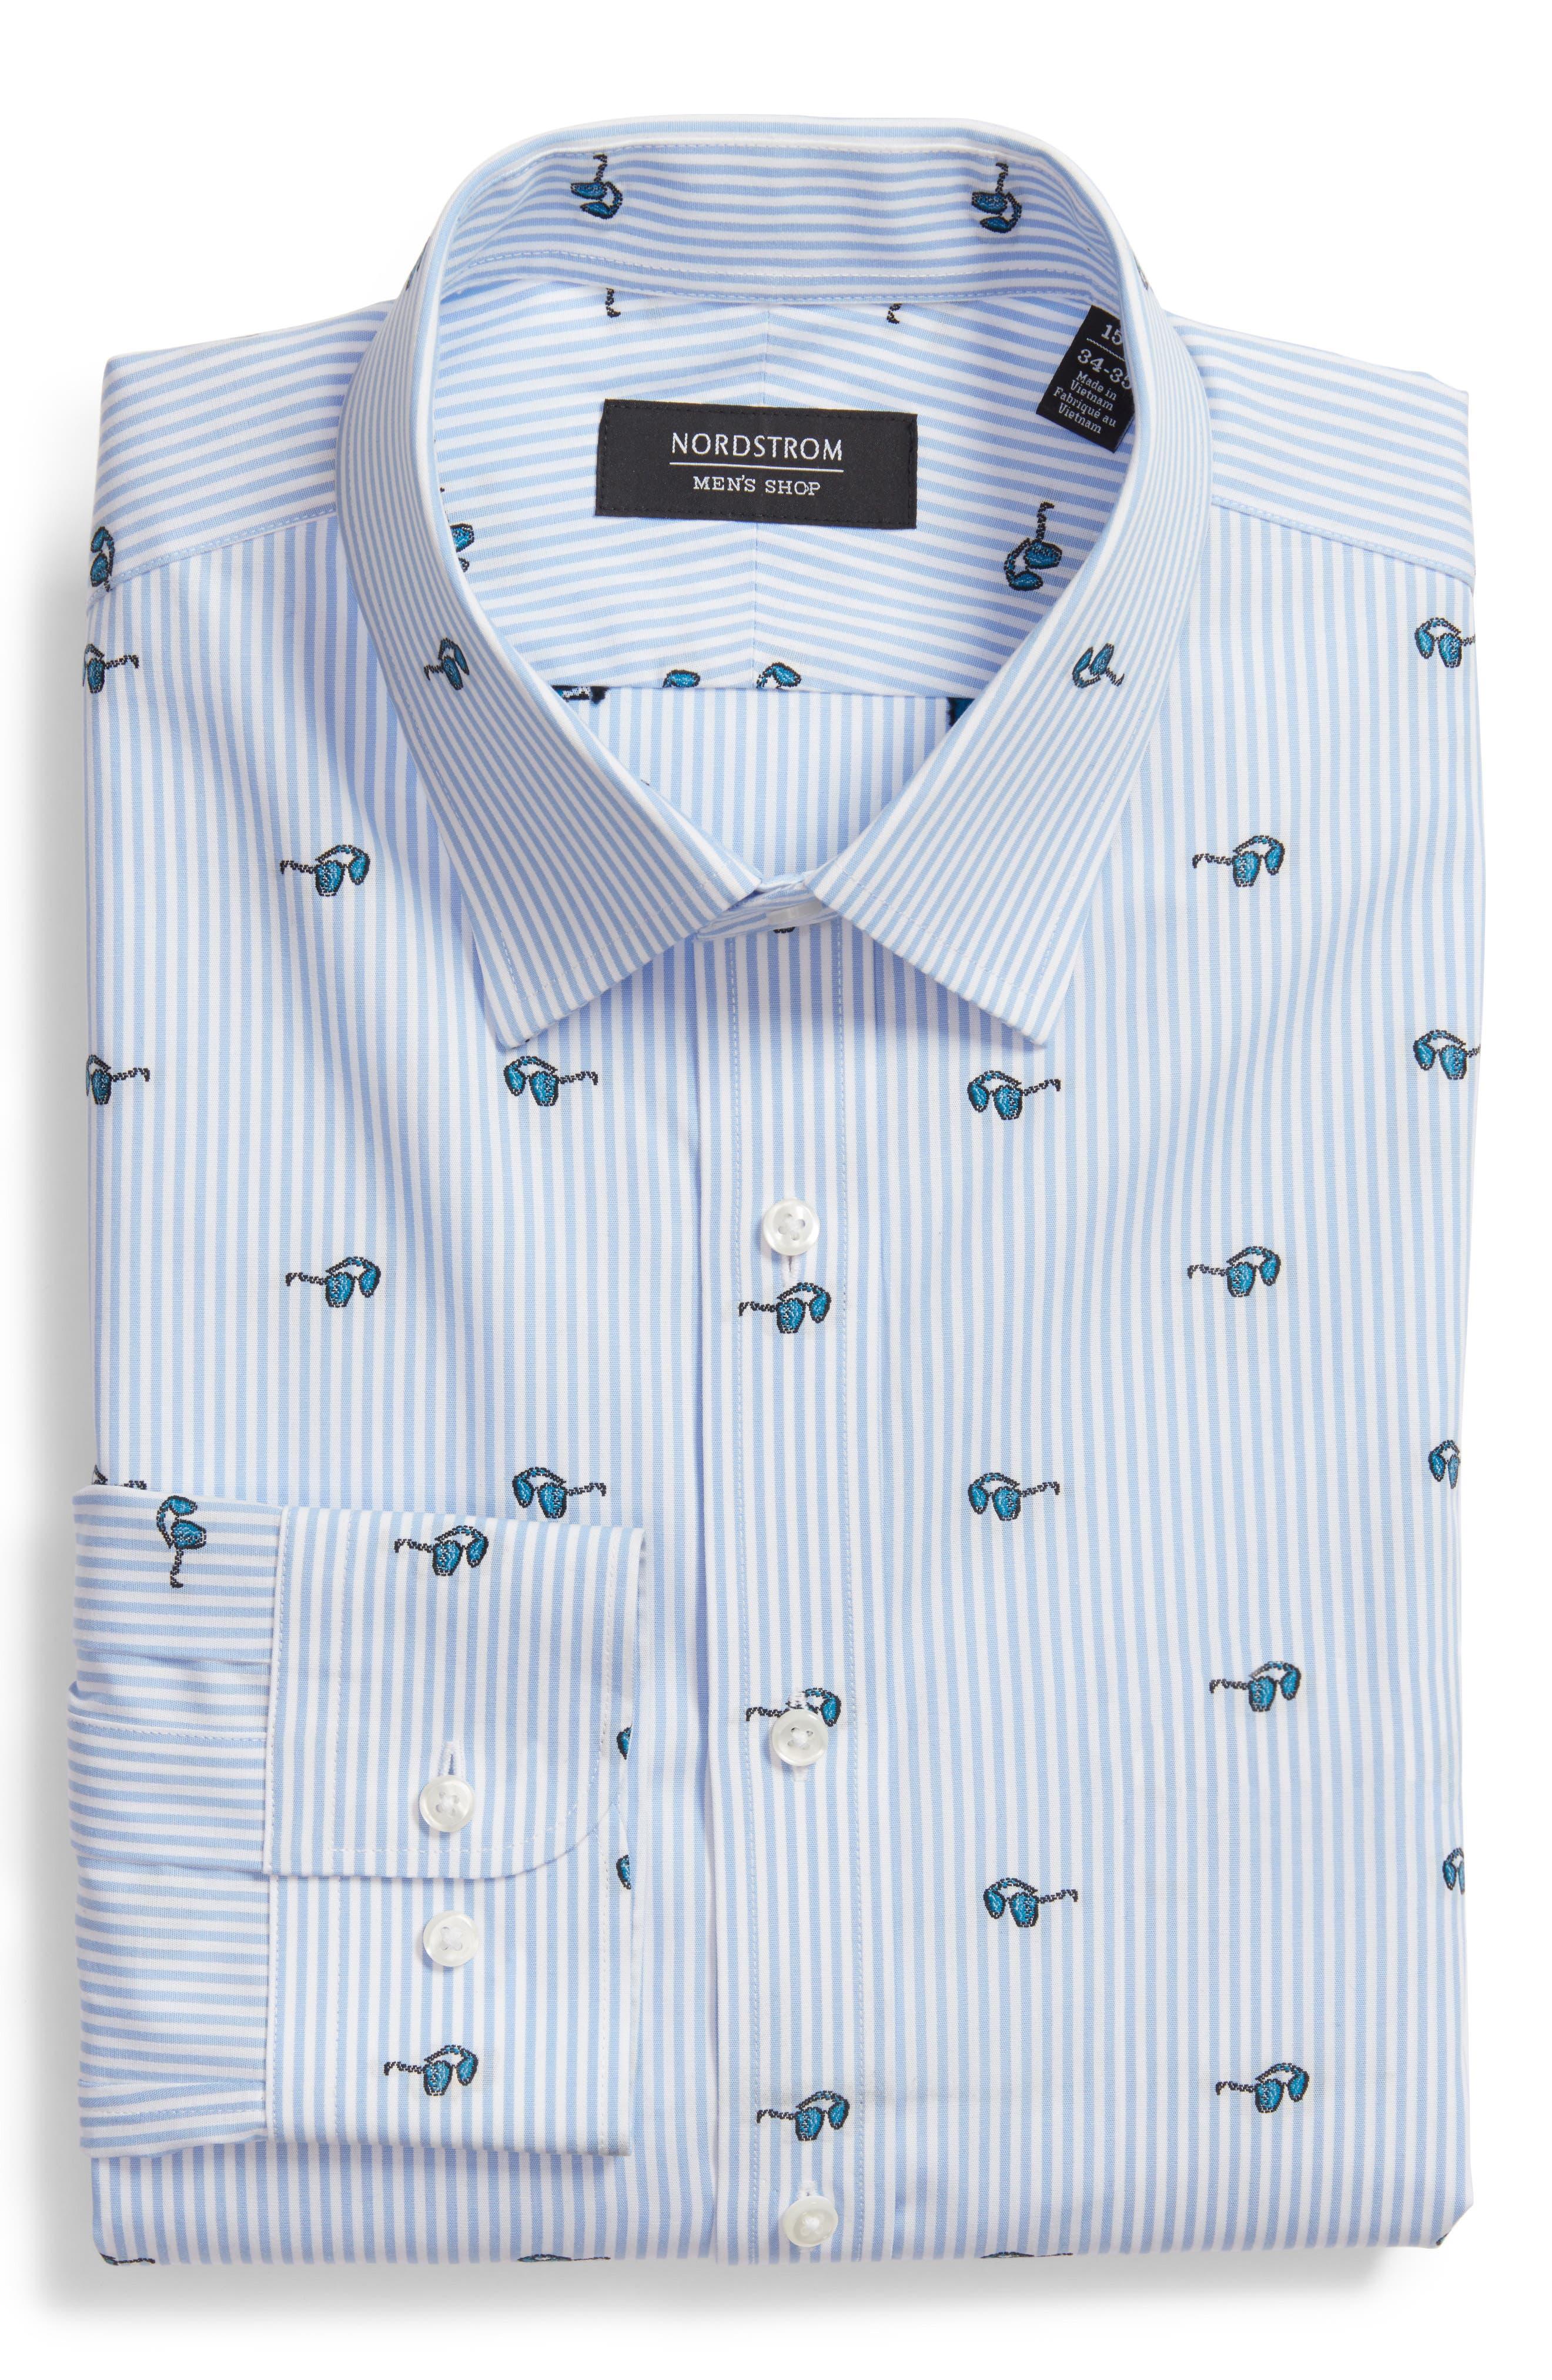 Alternate Image 1 Selected - Nordstrom Men's Shop Trim Fit Sunglasses Print Dress Shirt